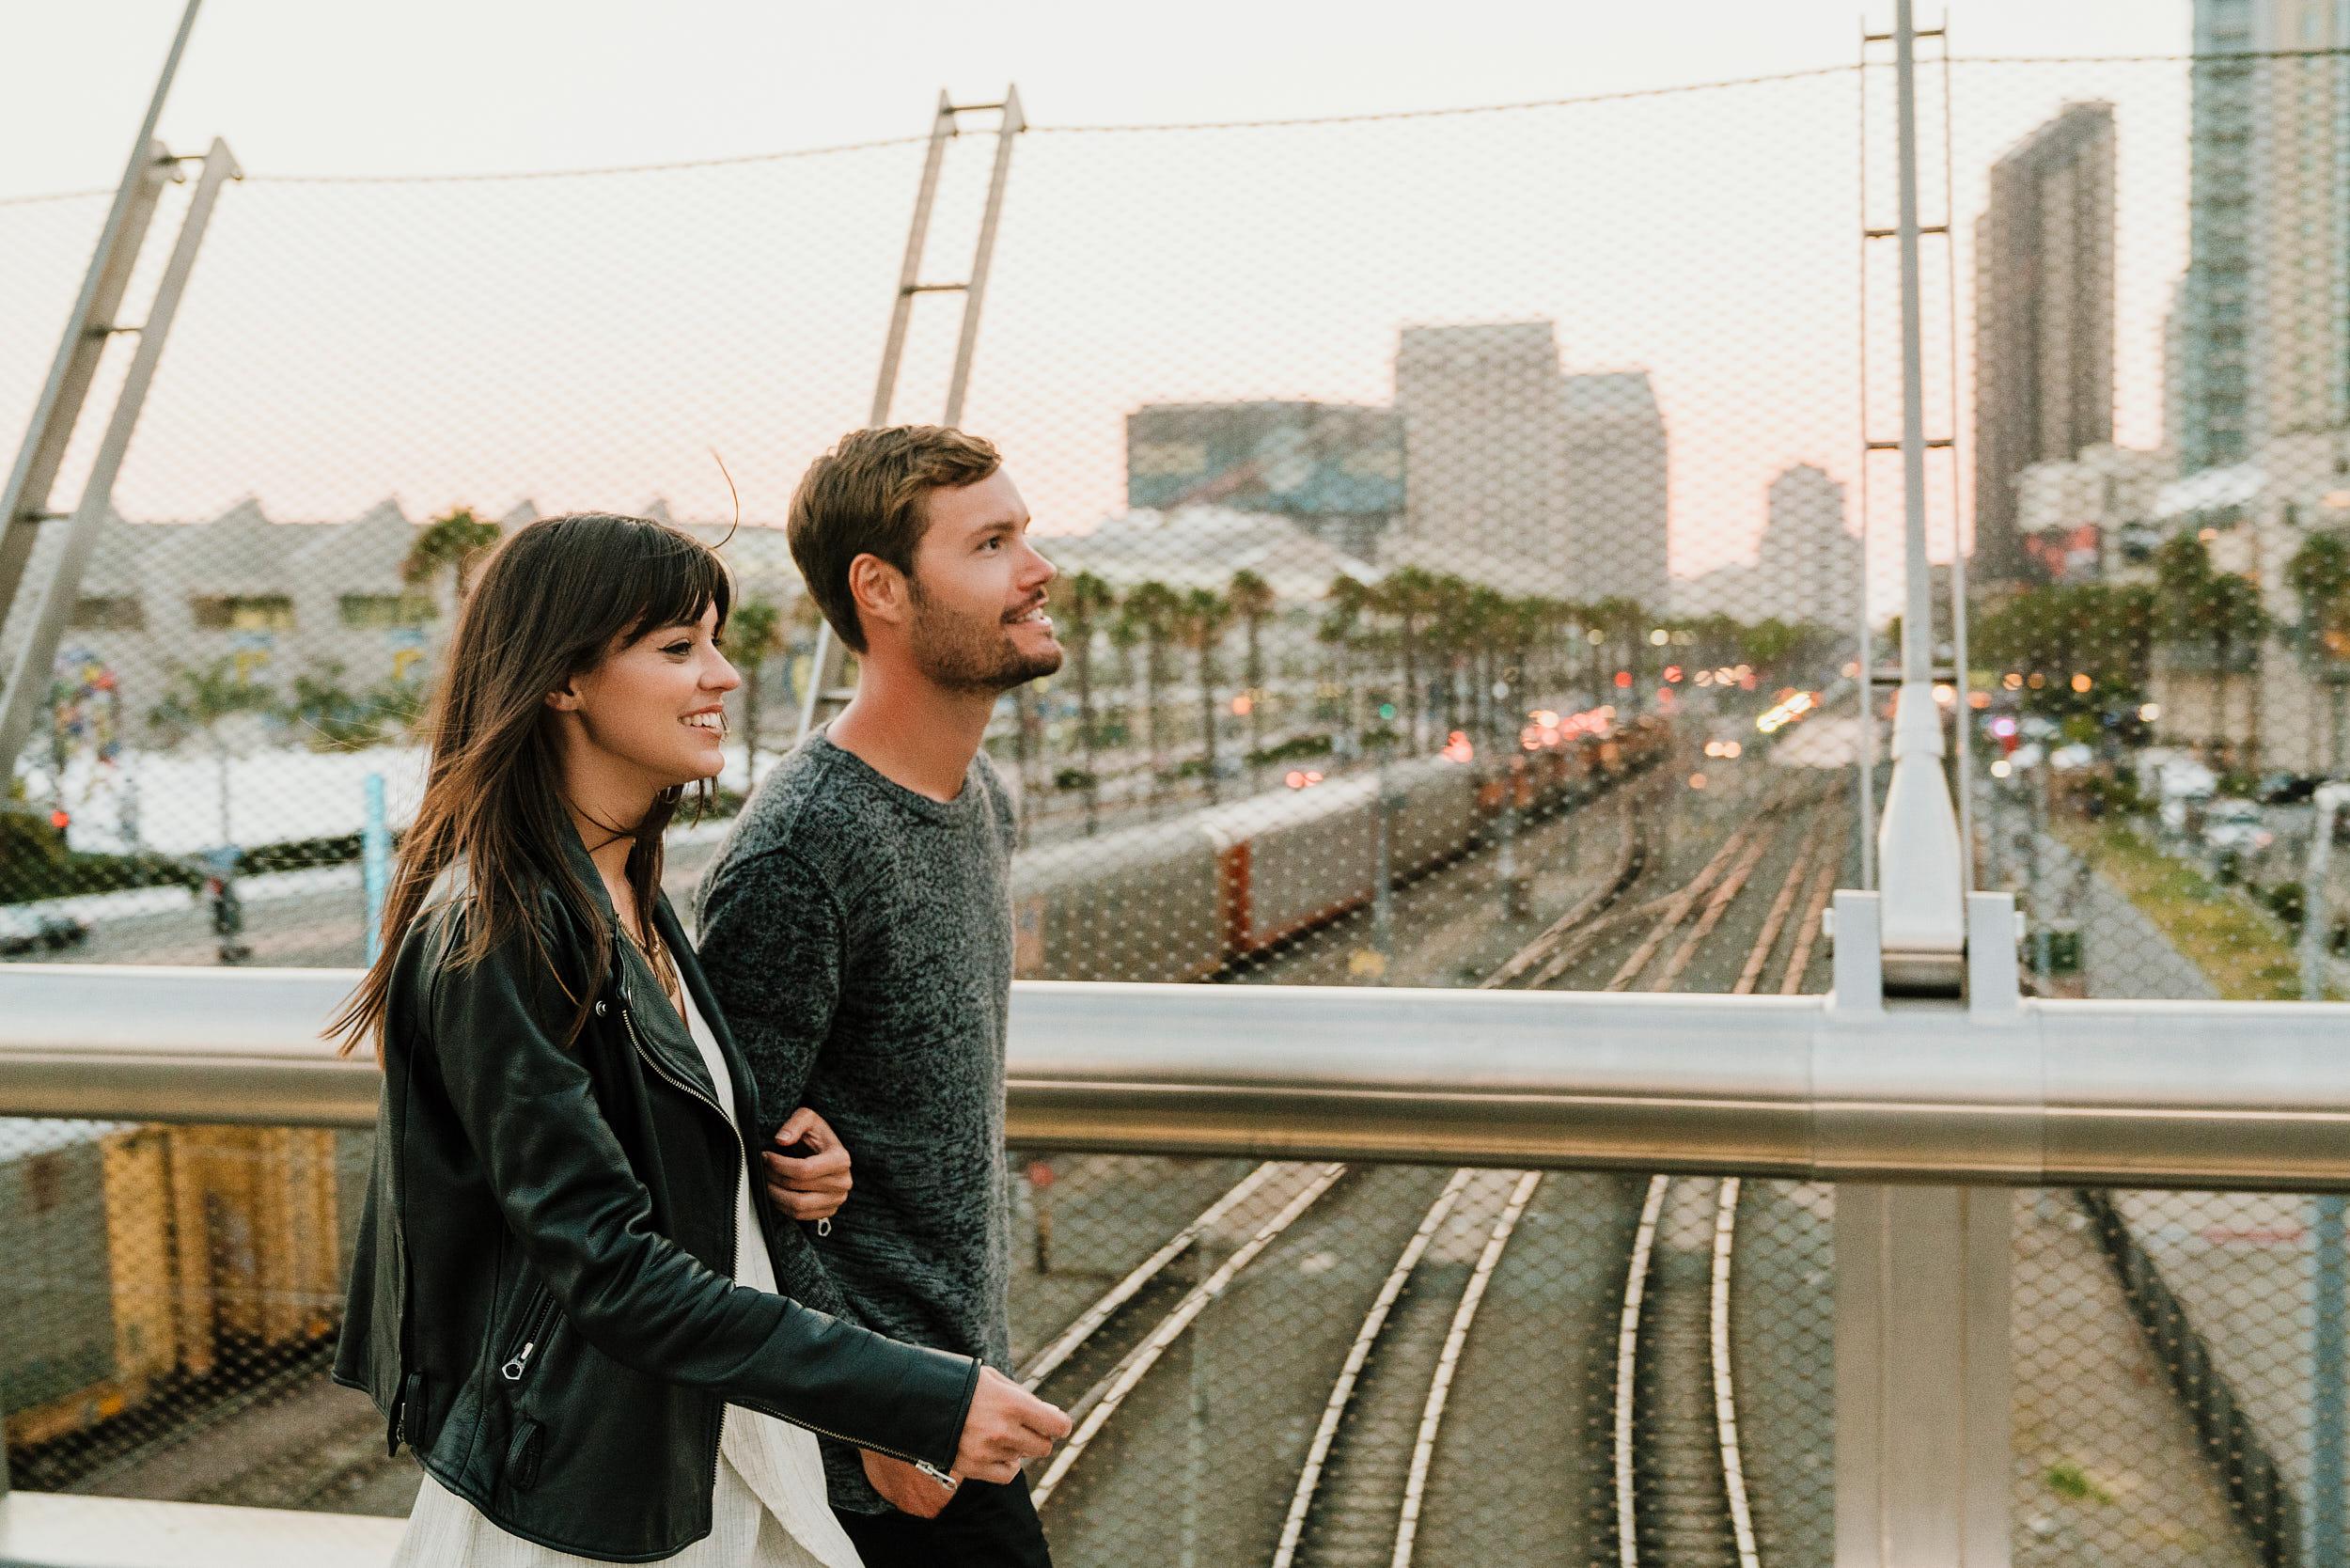 Joe Friend Photography | Lifestyle Photography | Studio Fabric San Diego